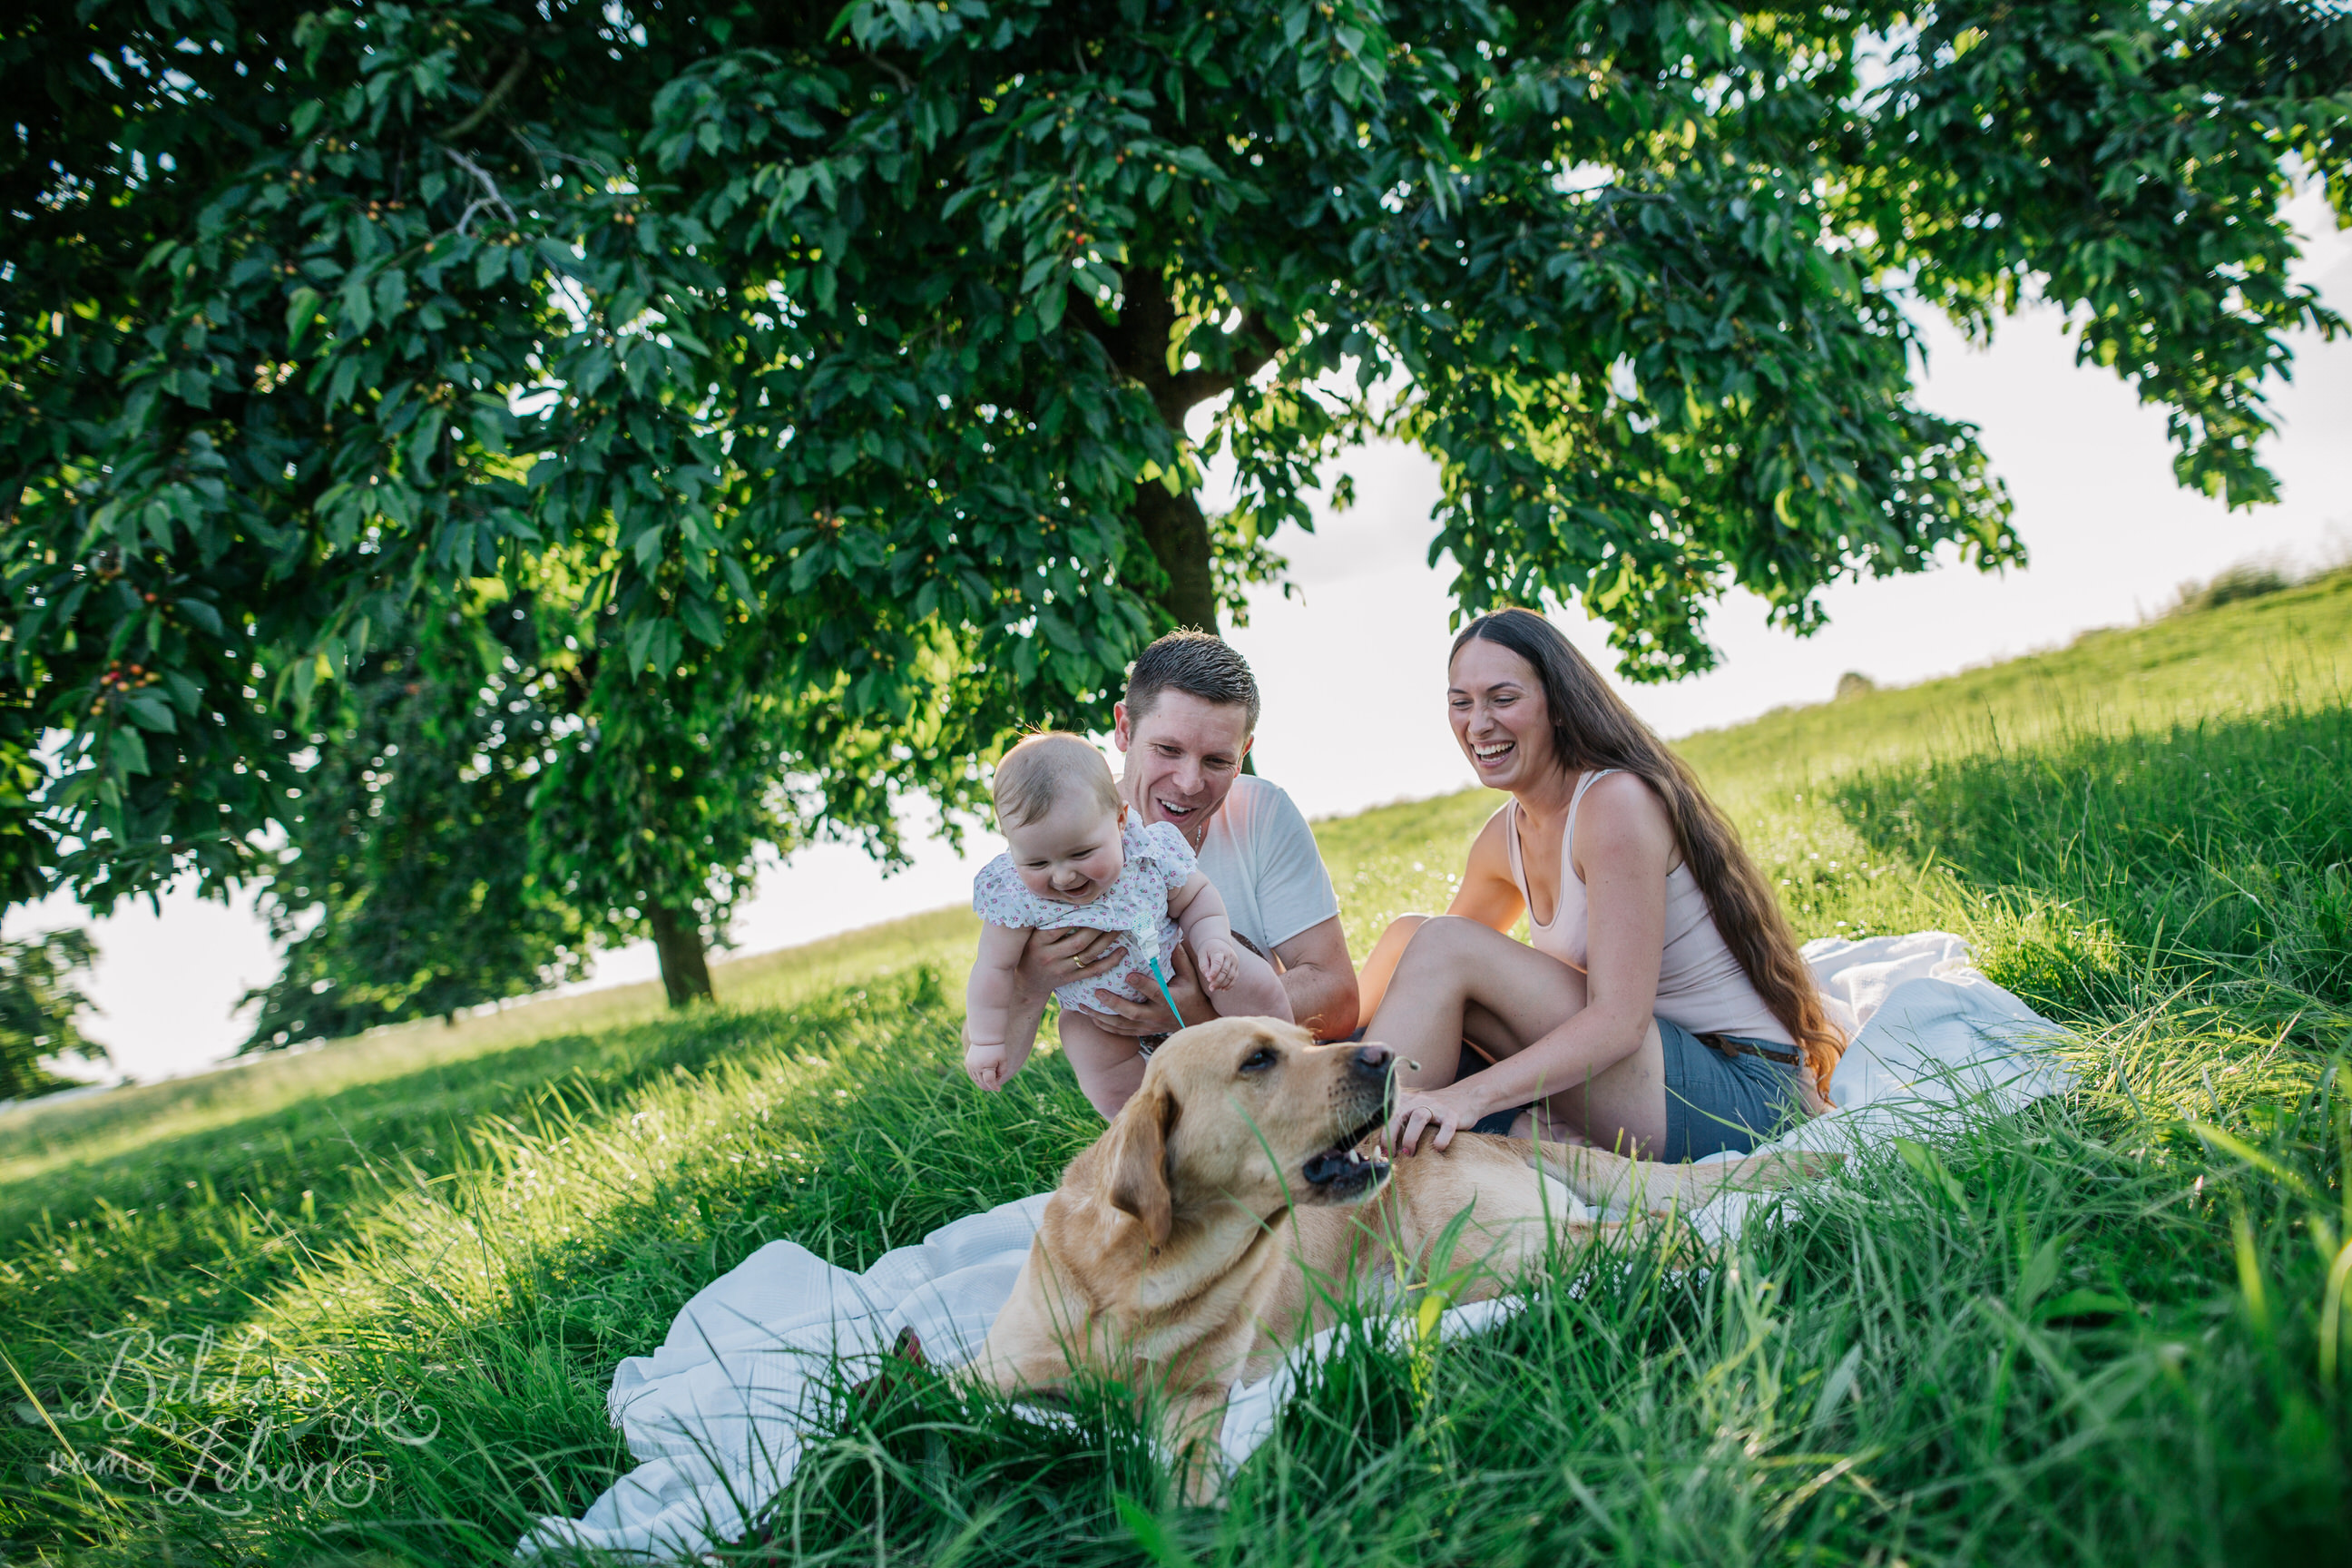 Greta-Labrador-Kinder-Portraits-BildervomLeben-2016-8137